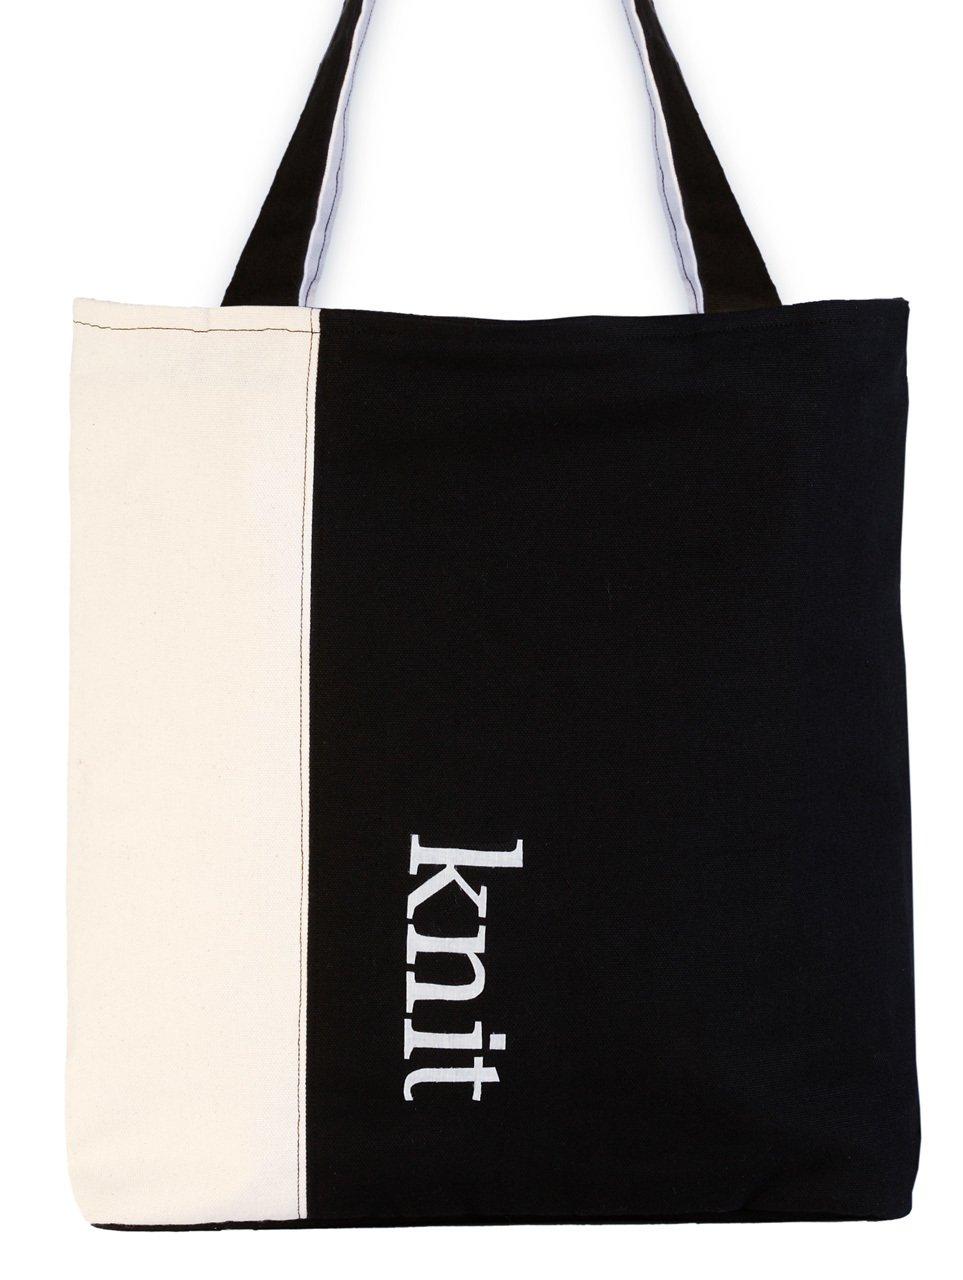 KNIT/PURL BAG